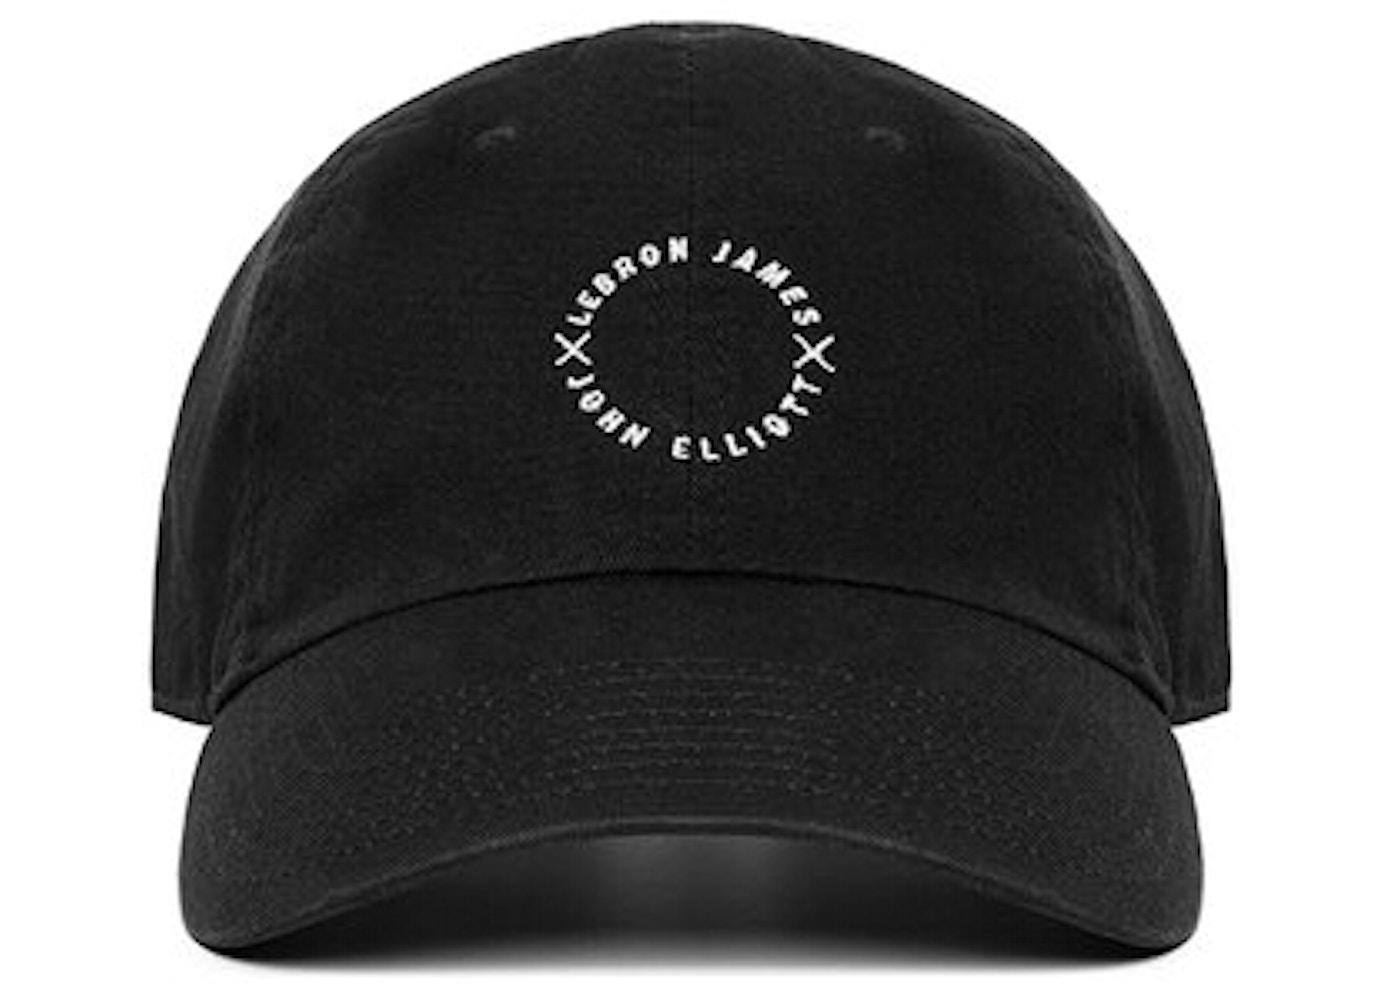 2c9f003aa0b ... True Snapback Hat Red Unisex Adult 658  Nike Lebron James x John  Elliott H86 Hat Black ...